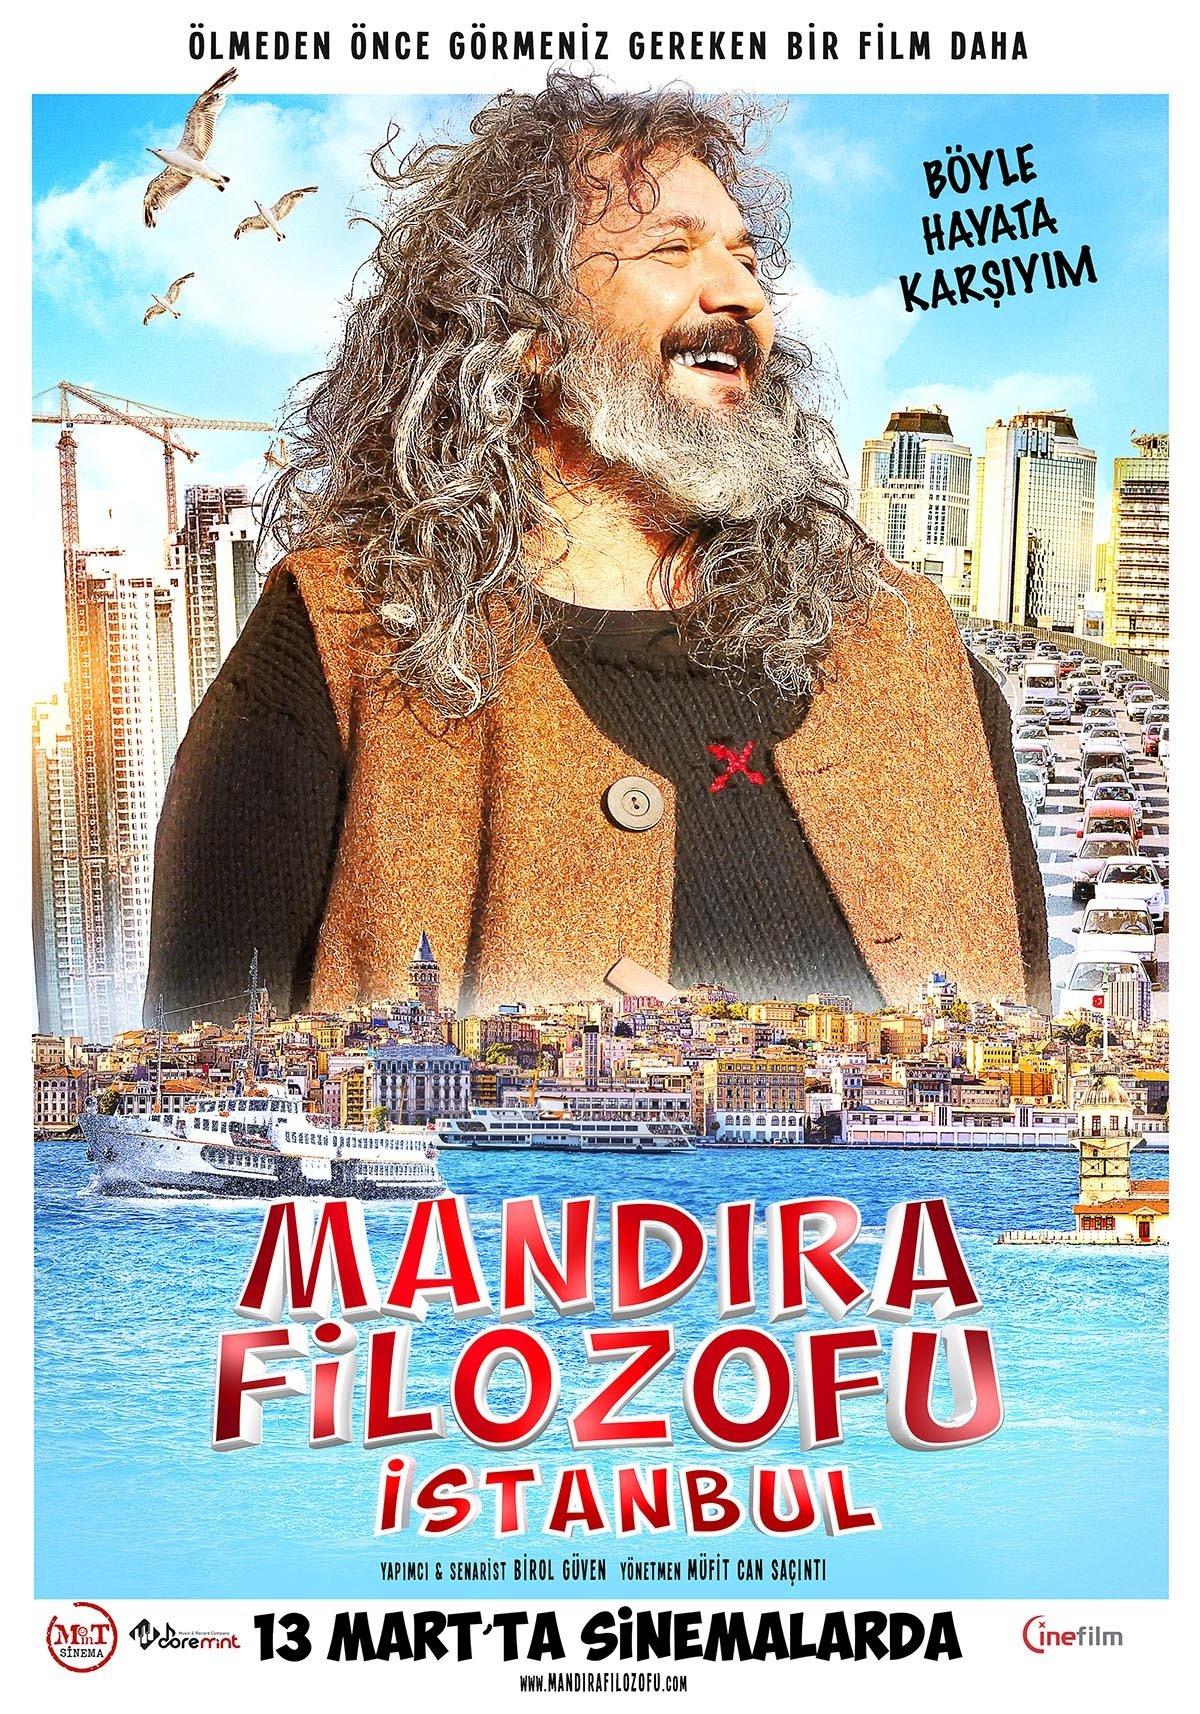 Mandira Filozofu Istanbul 2015 Imdb